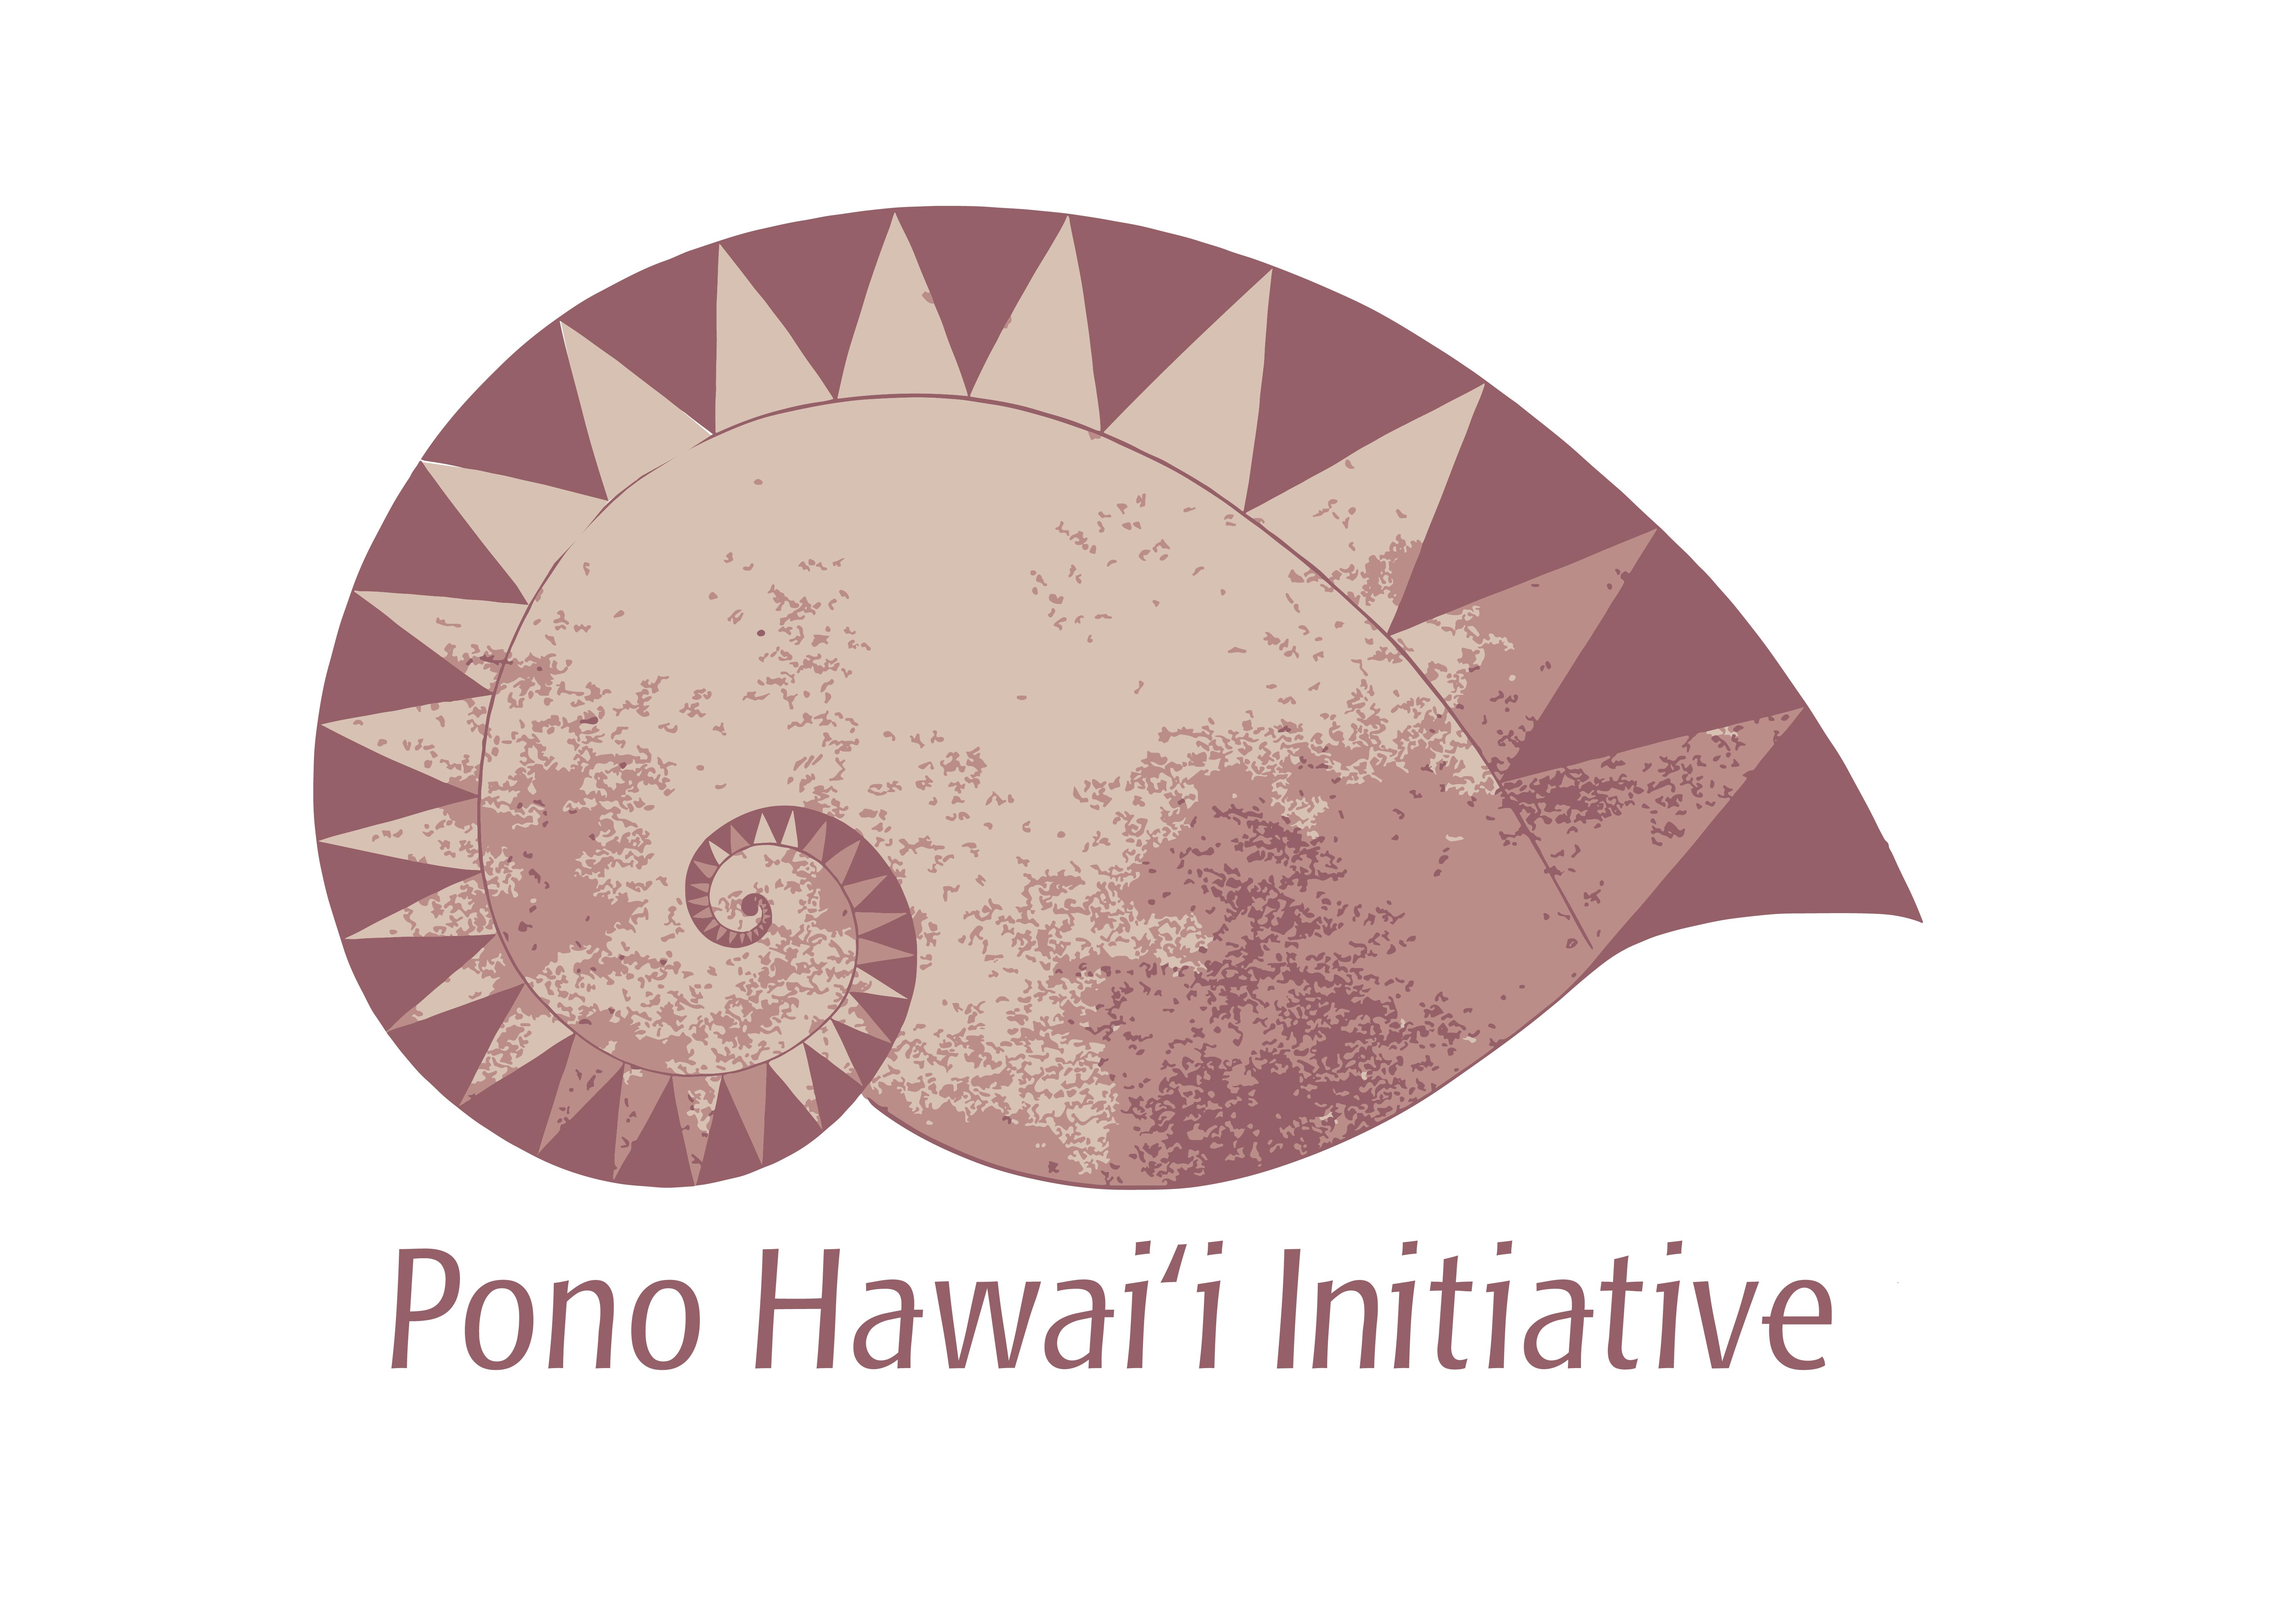 Pono Hawaii Initiative